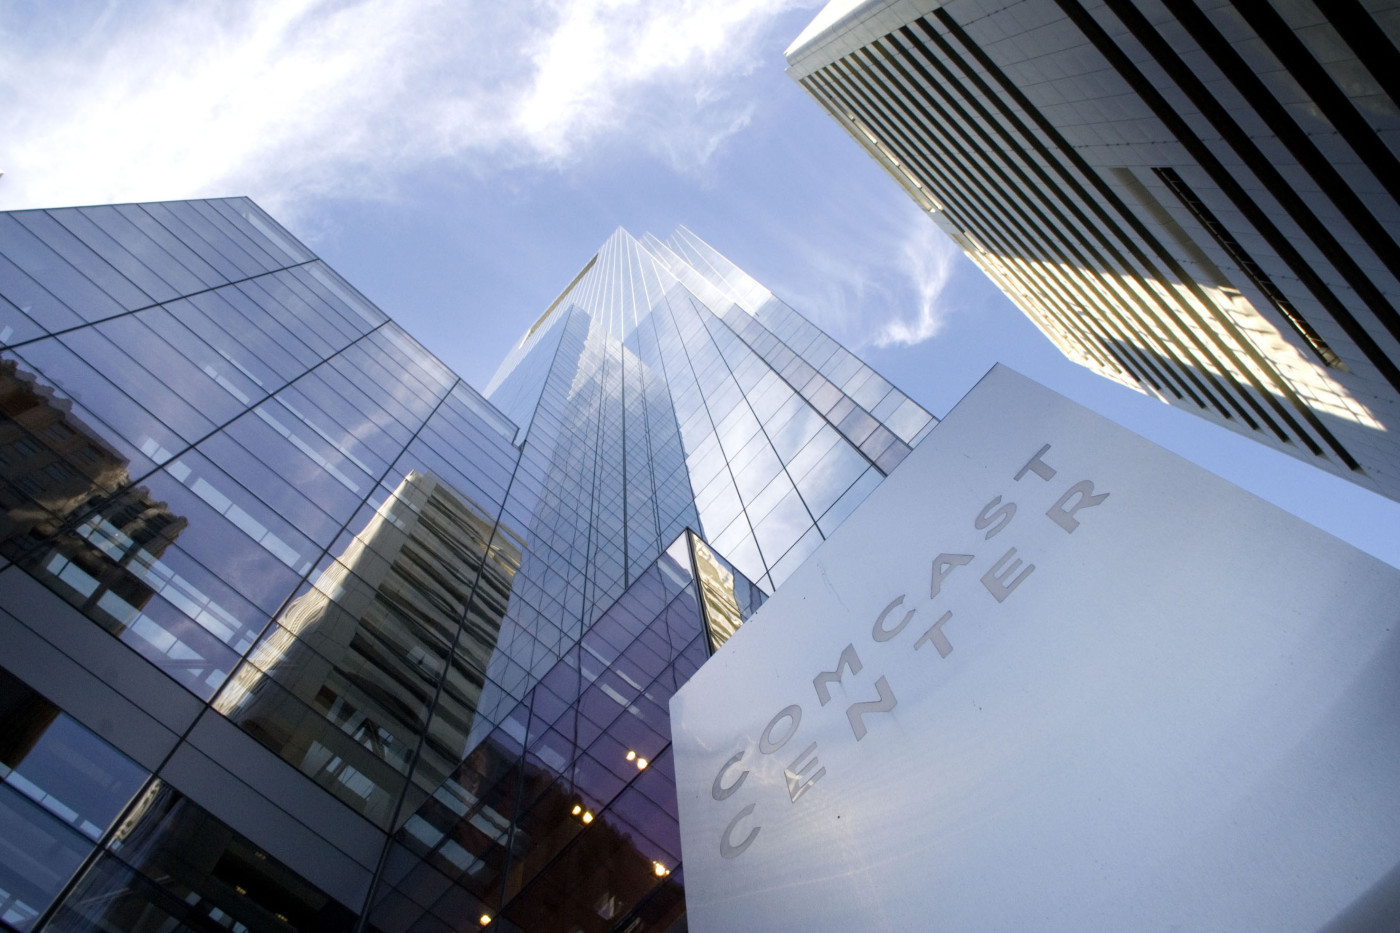 The Comcast Center, home to Comcast's corporate headquarters, in Philadelphia.